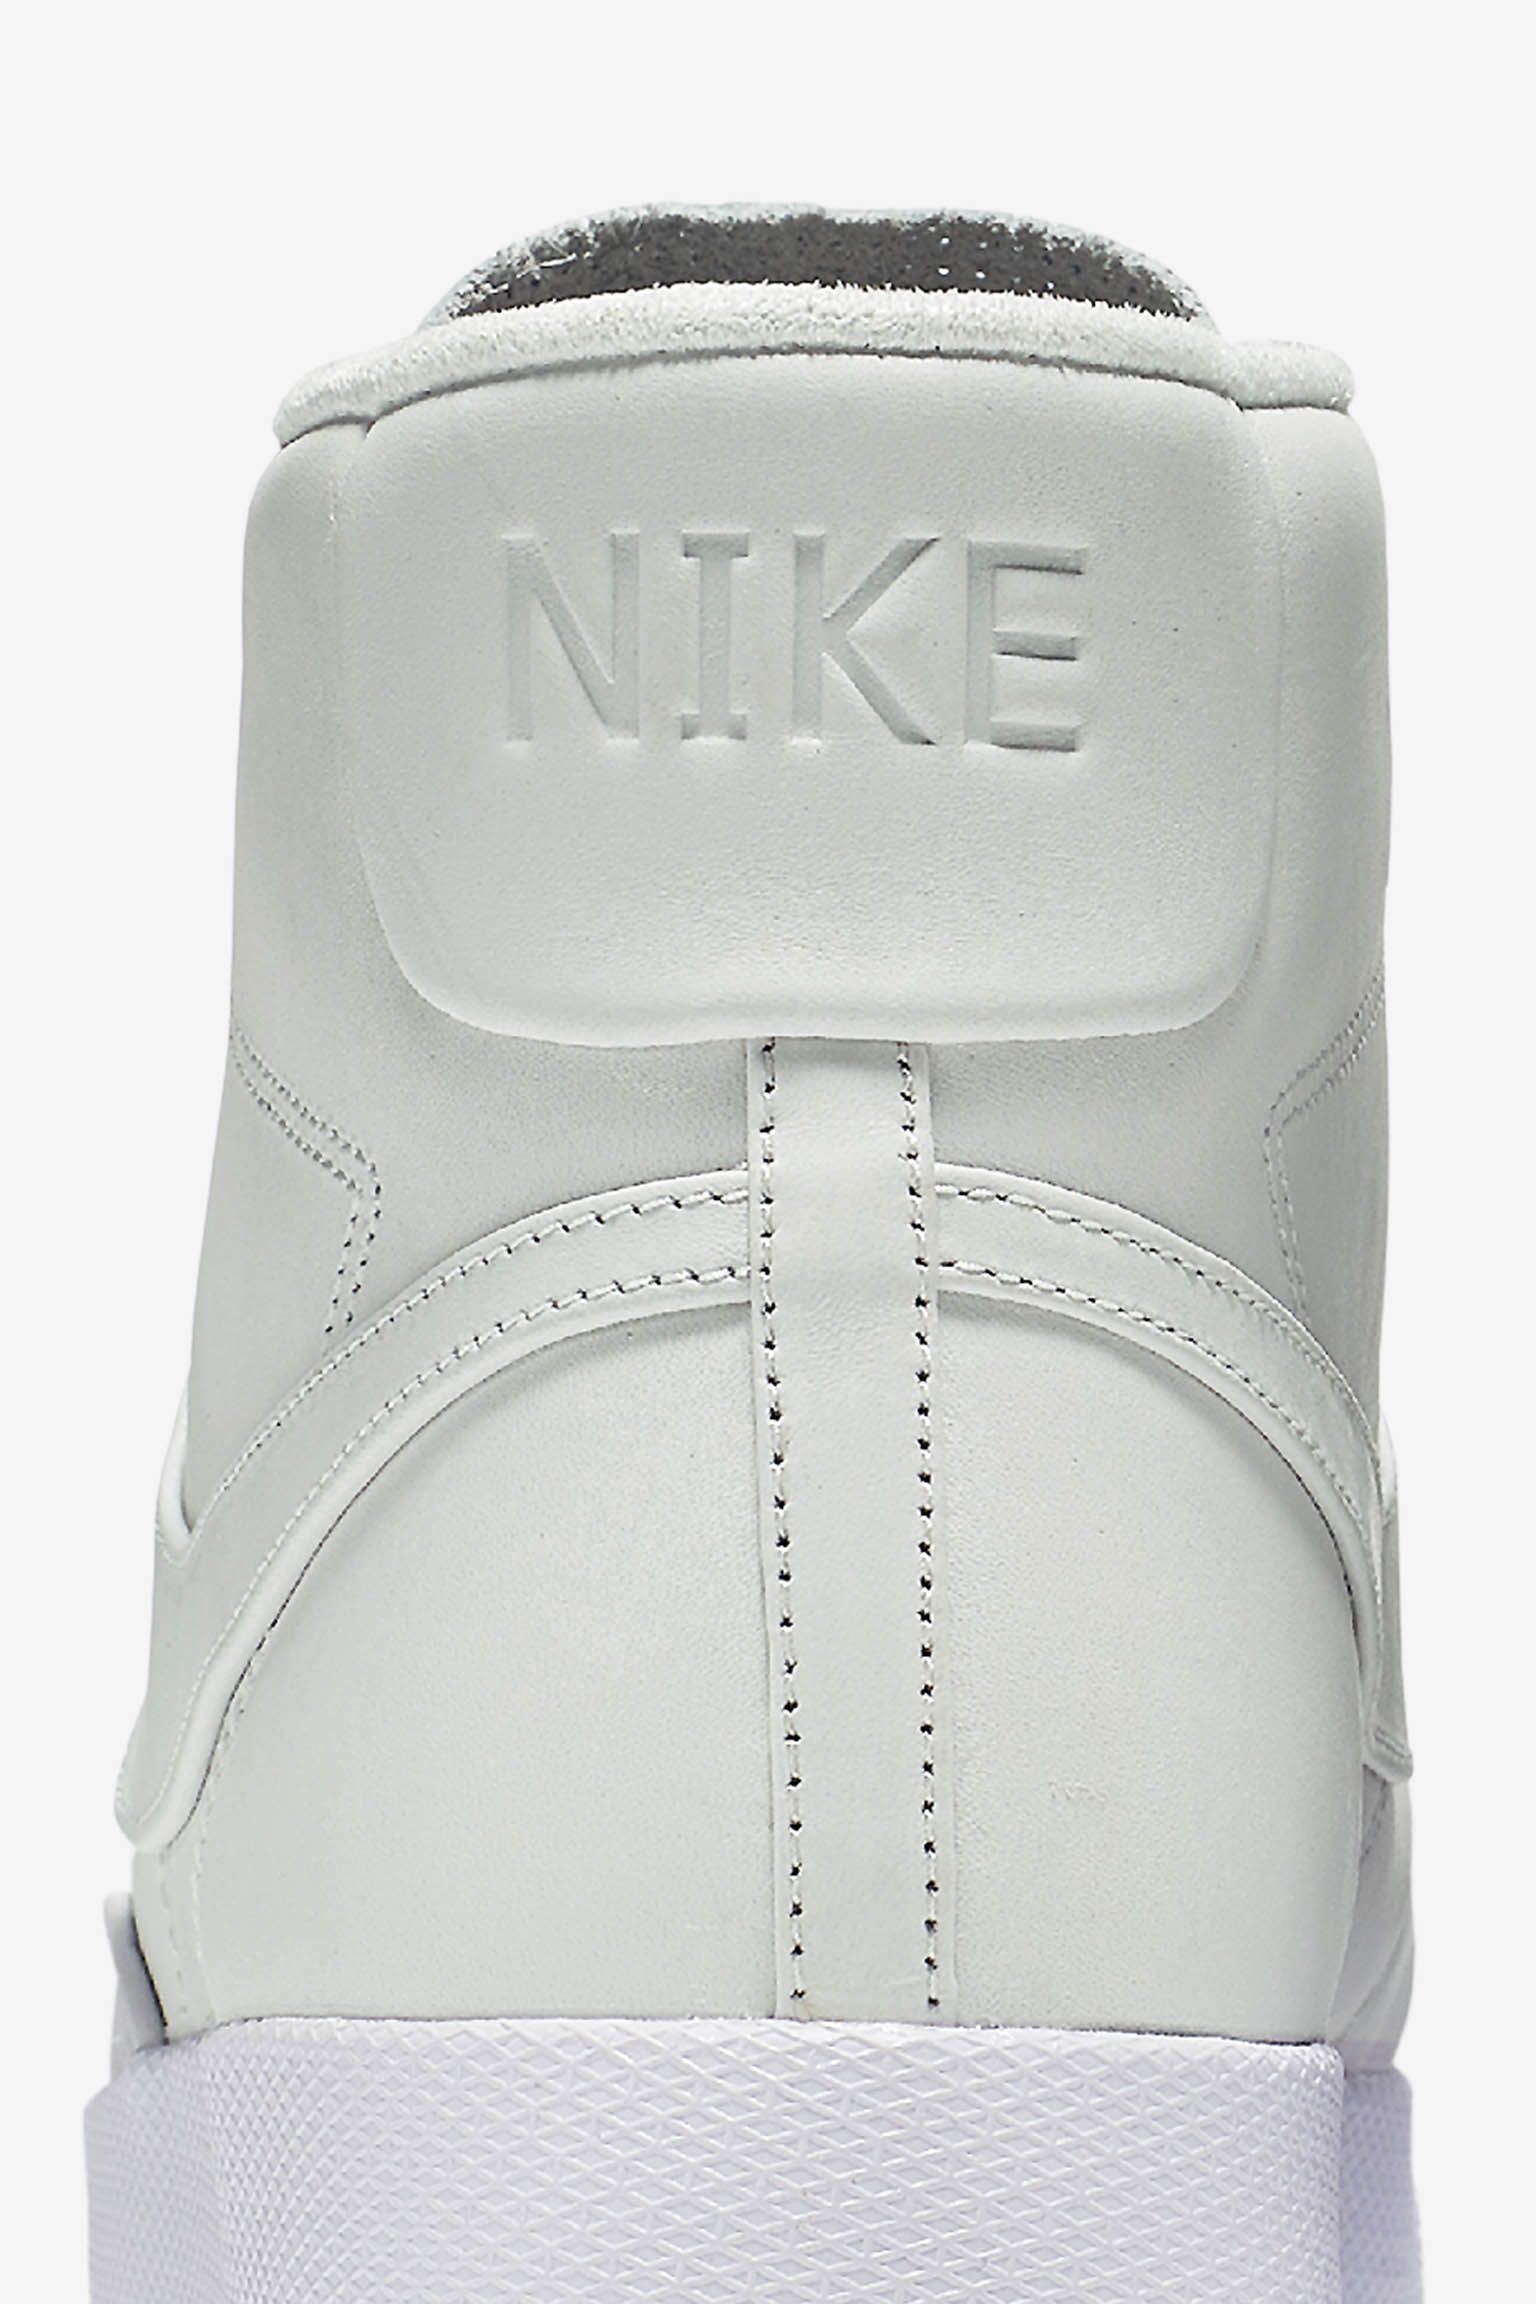 NikeLab Blazer Advanced 'Off White'